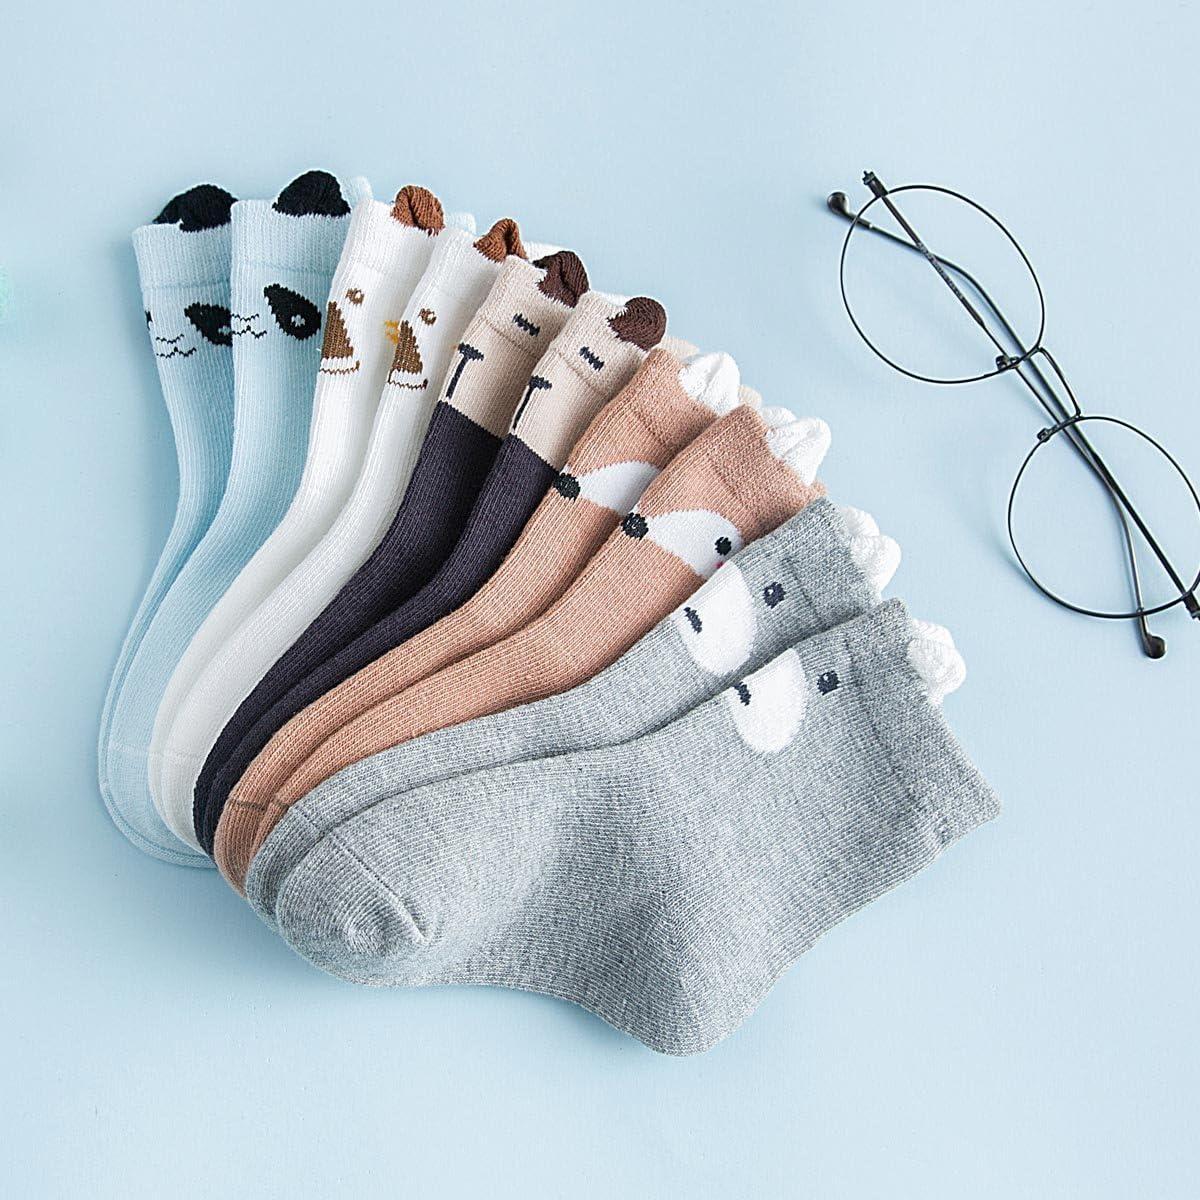 Aivtalk Baby Boys Girls Socks Cotton Warm Ankle High Socks 5 Pairs Assorted Socks Set